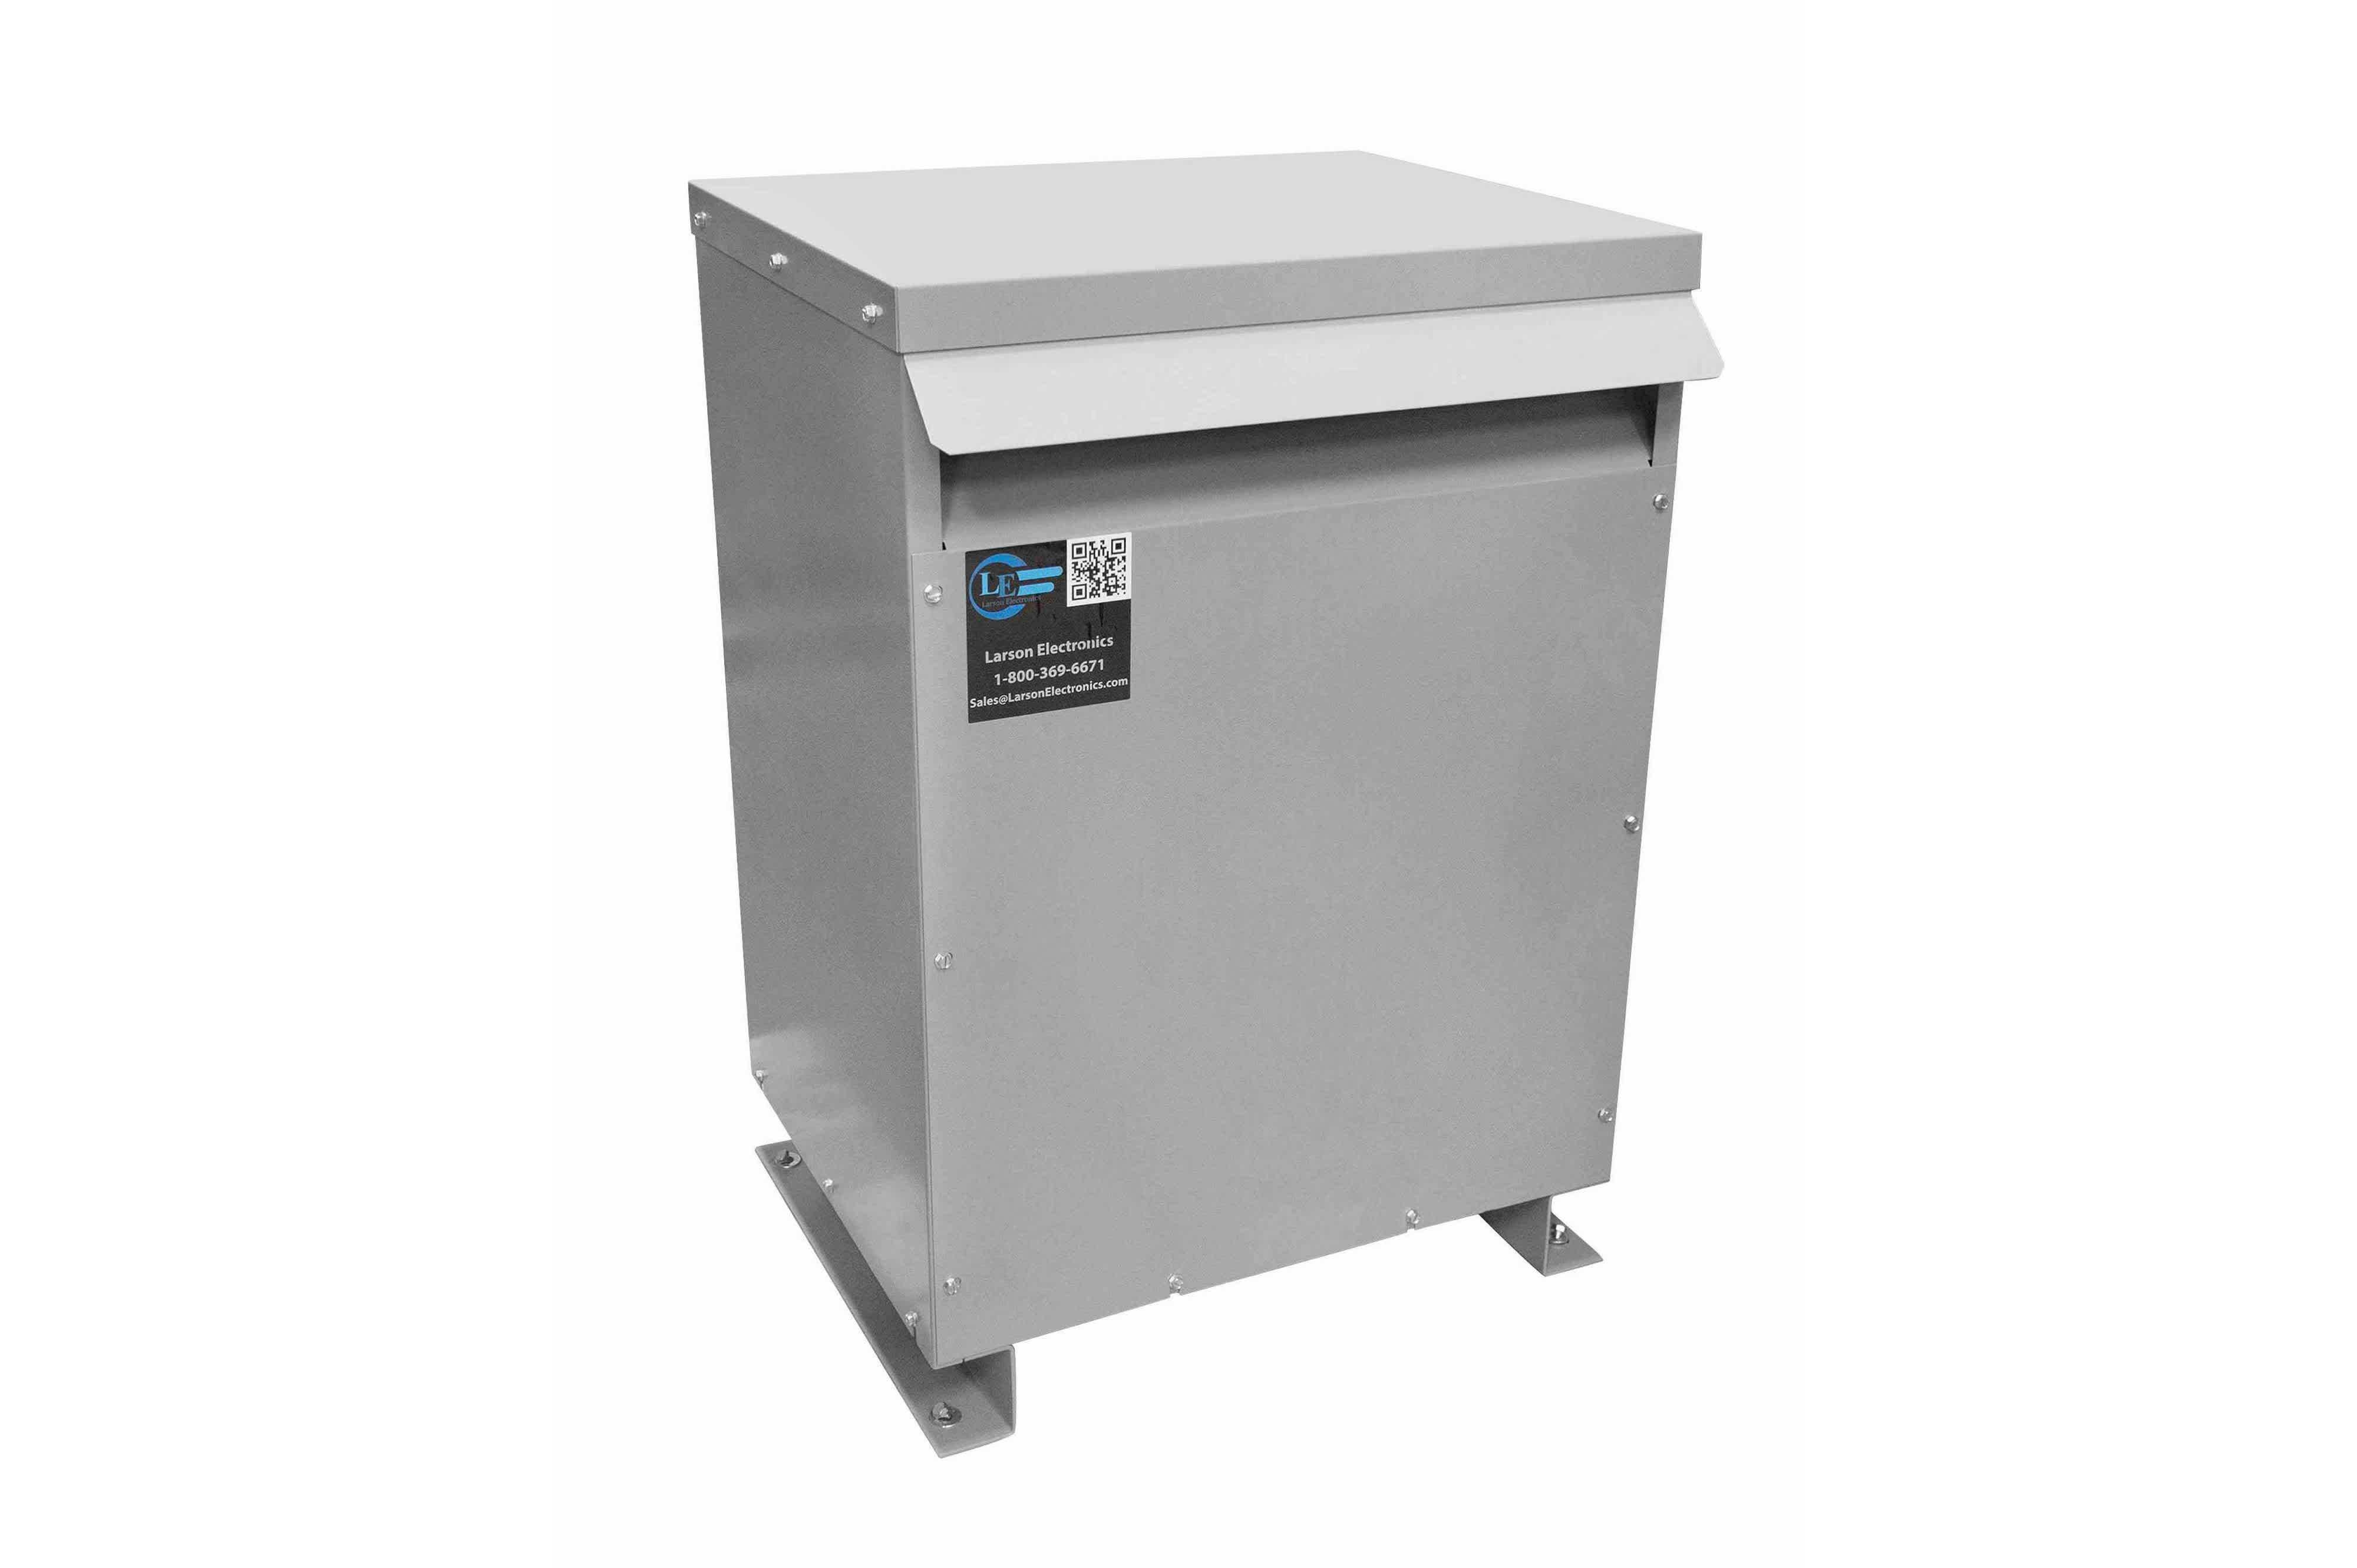 400 kVA 3PH DOE Transformer, 380V Delta Primary, 600Y/347 Wye-N Secondary, N3R, Ventilated, 60 Hz